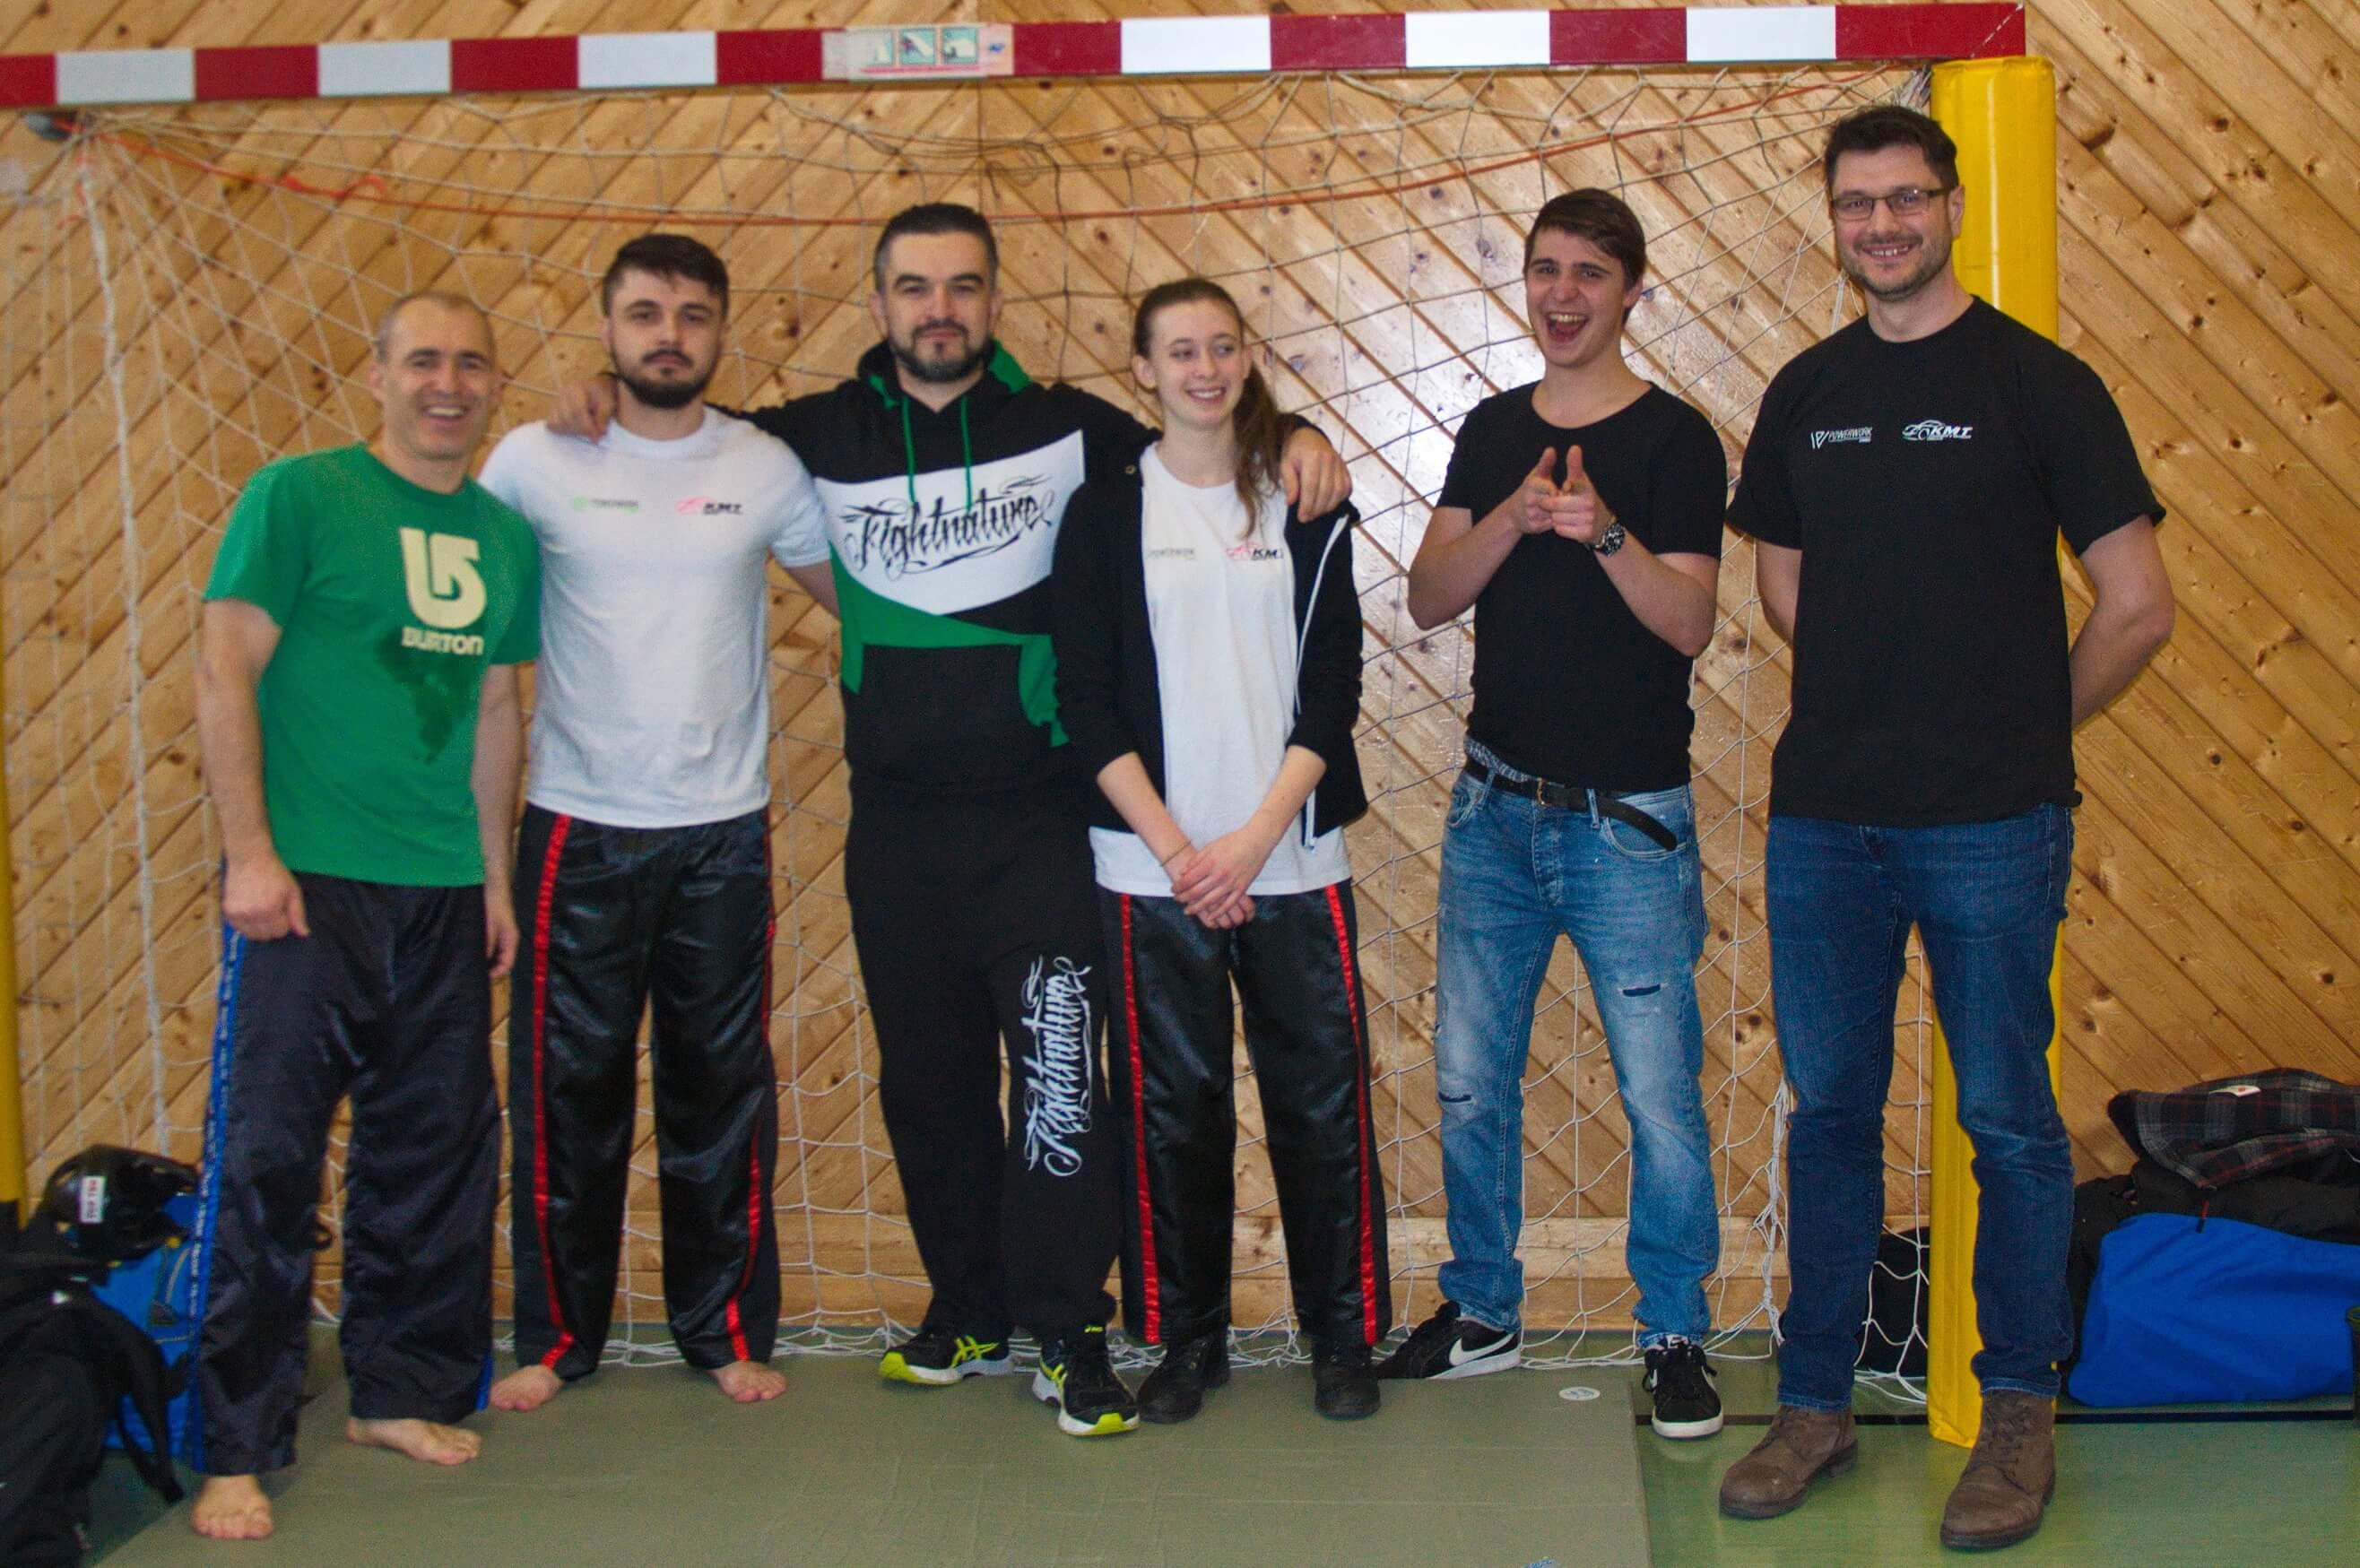 kickboxen-lenzing-lm-2018-team